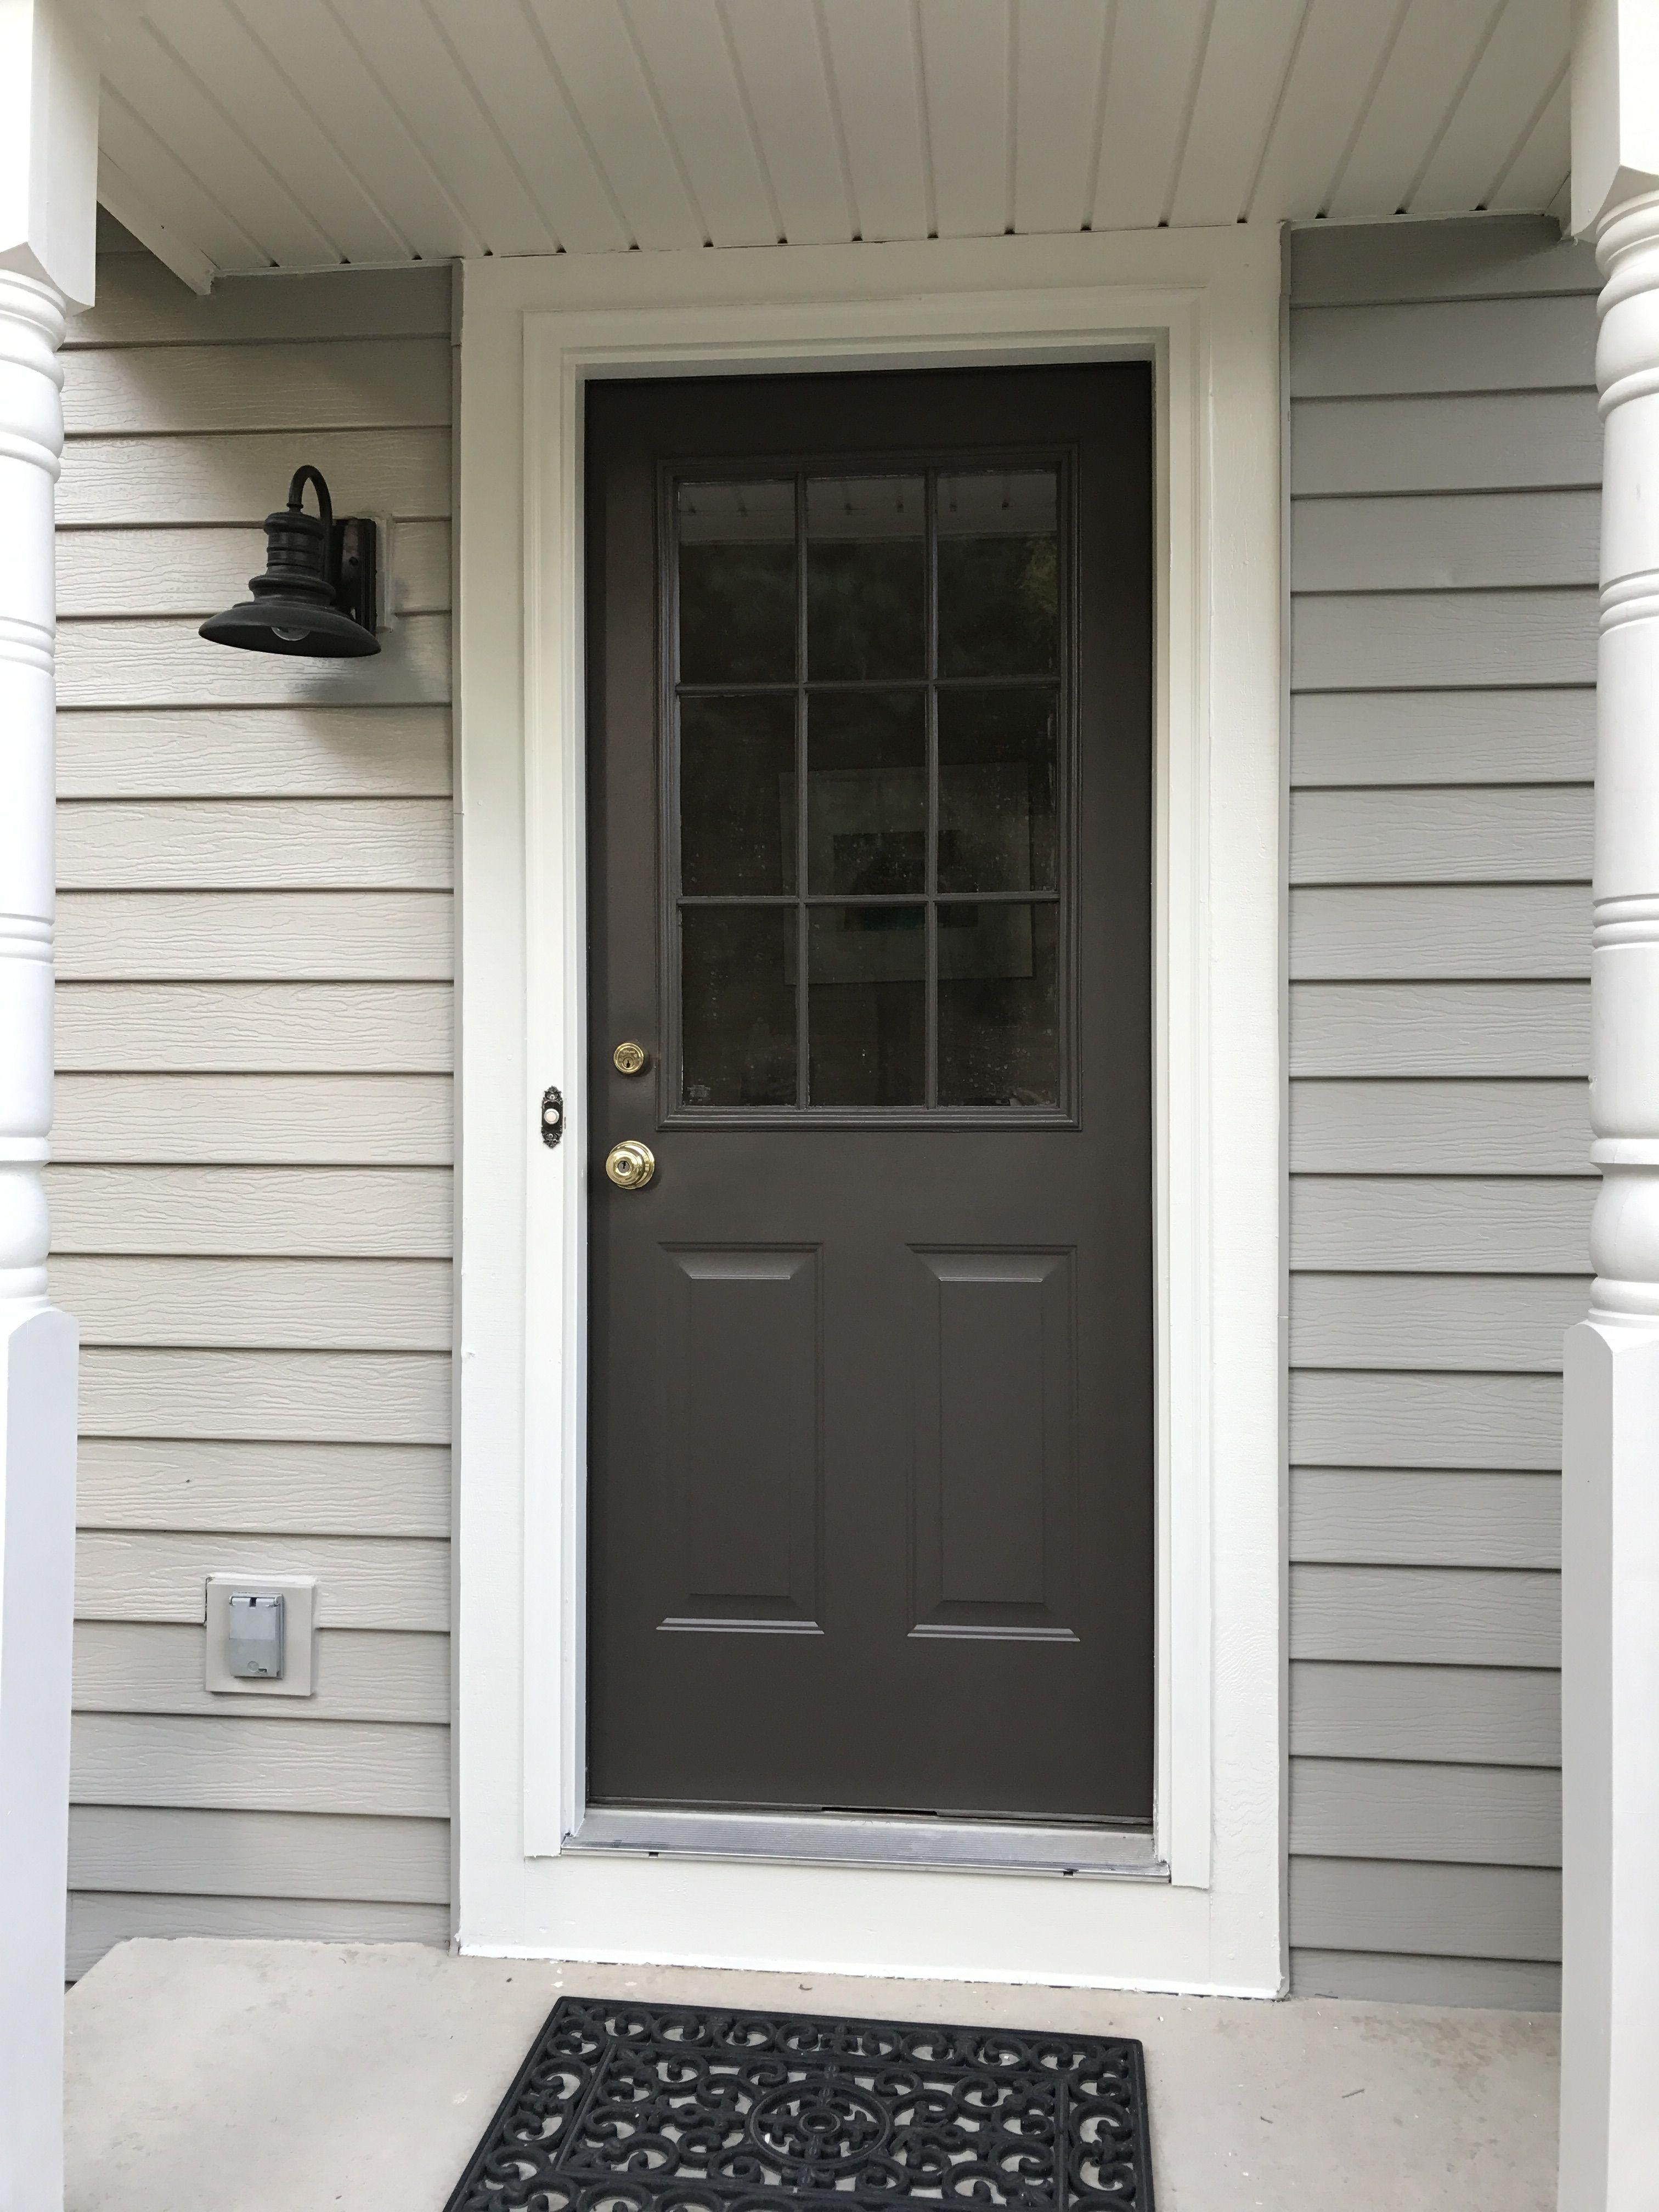 Door Sw Black Fox 7020 Siding Sw Dorian Gray 7017 Trim Sw Pearly White Exterior Door Colors Black Exterior Doors Gray House Exterior